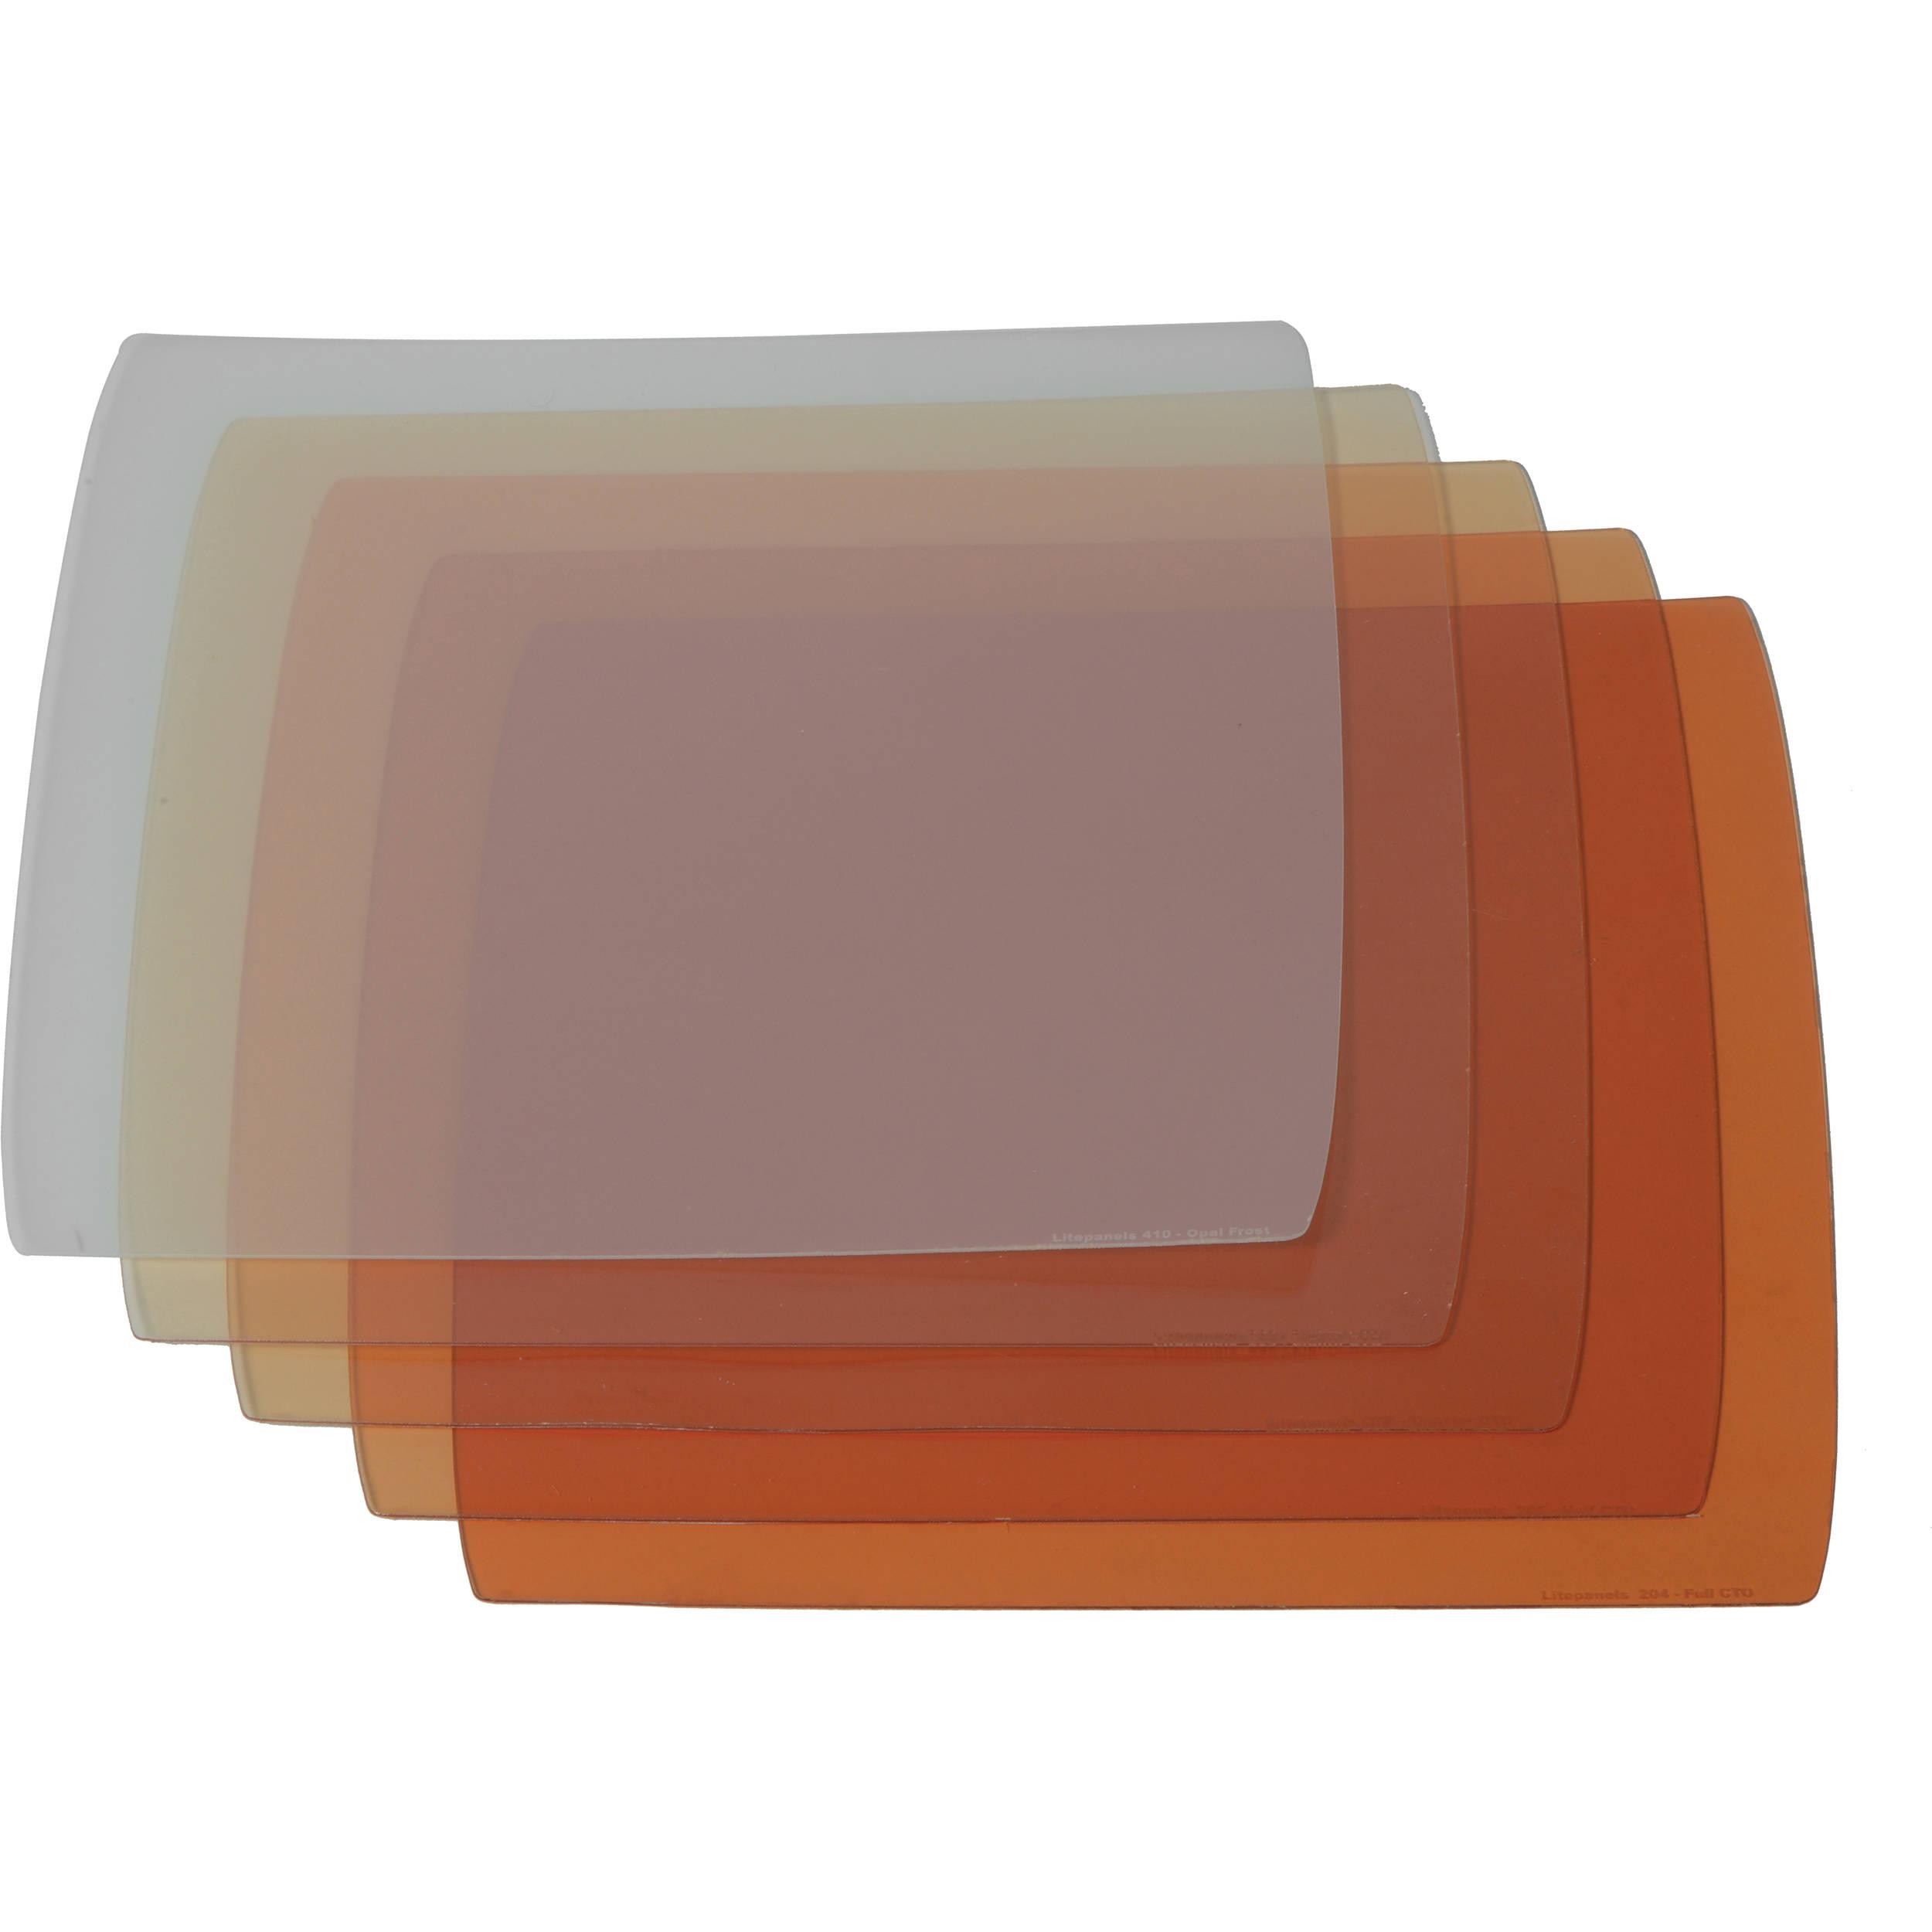 Astra 1x1 5-piece CTO Gel Set